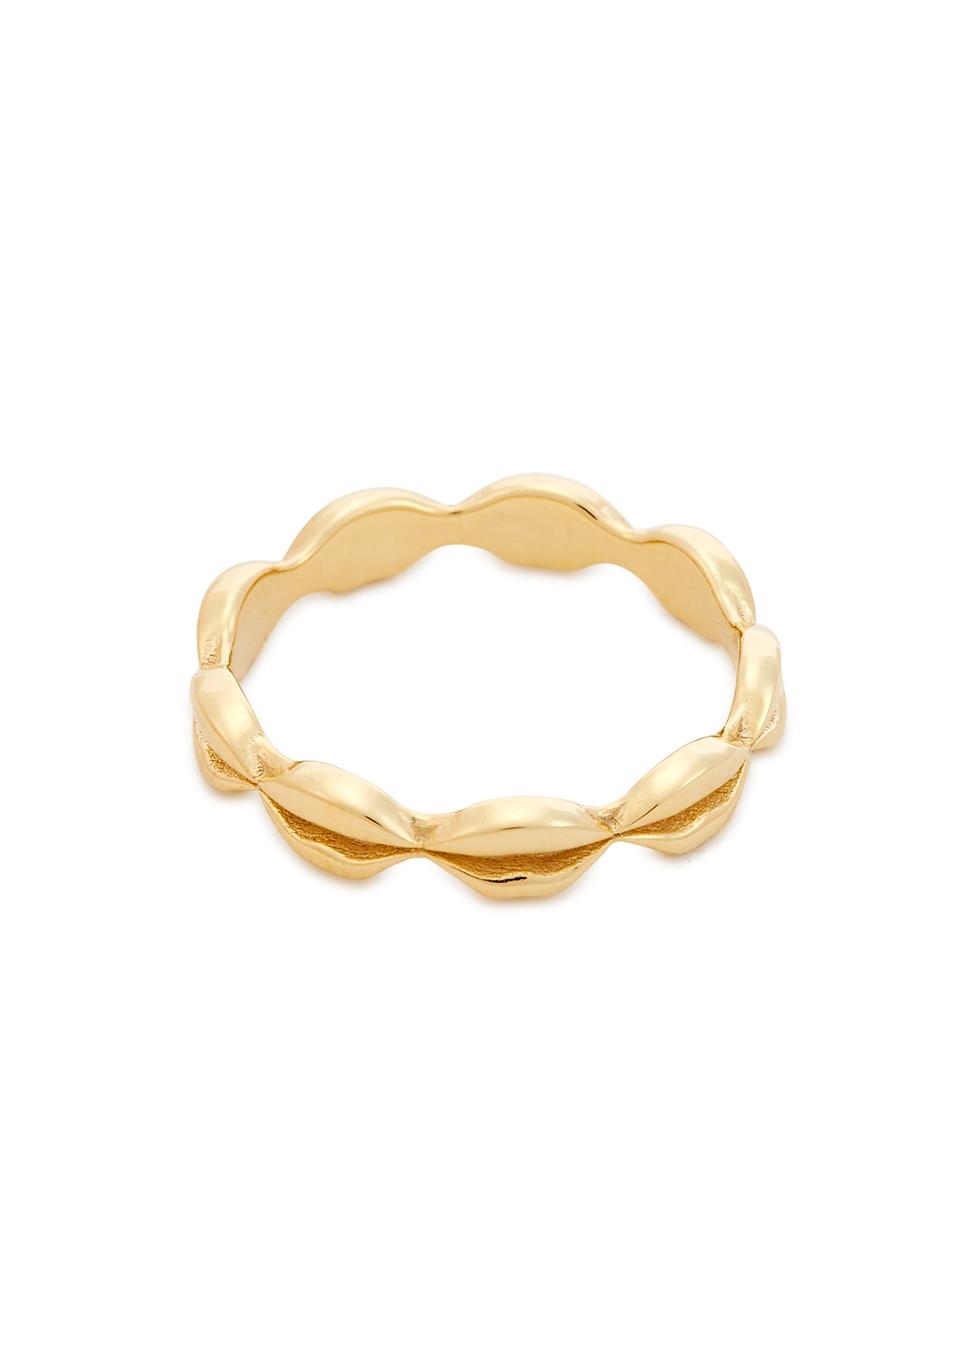 Vita Lips 18kt gold-plated ring